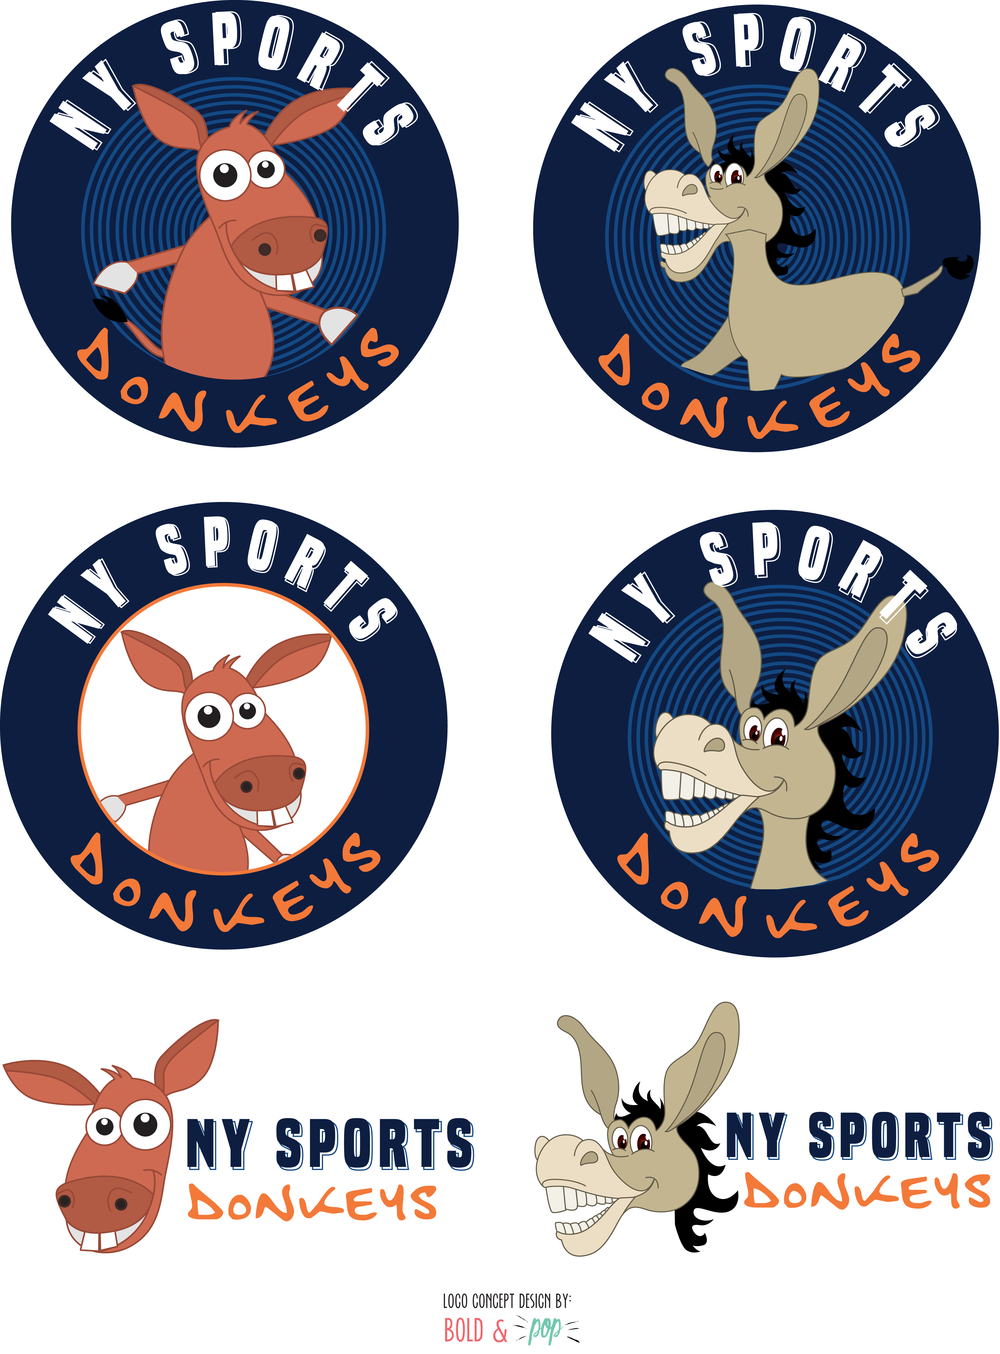 Bold & Pop : NY Sports Donkeys Branding Design